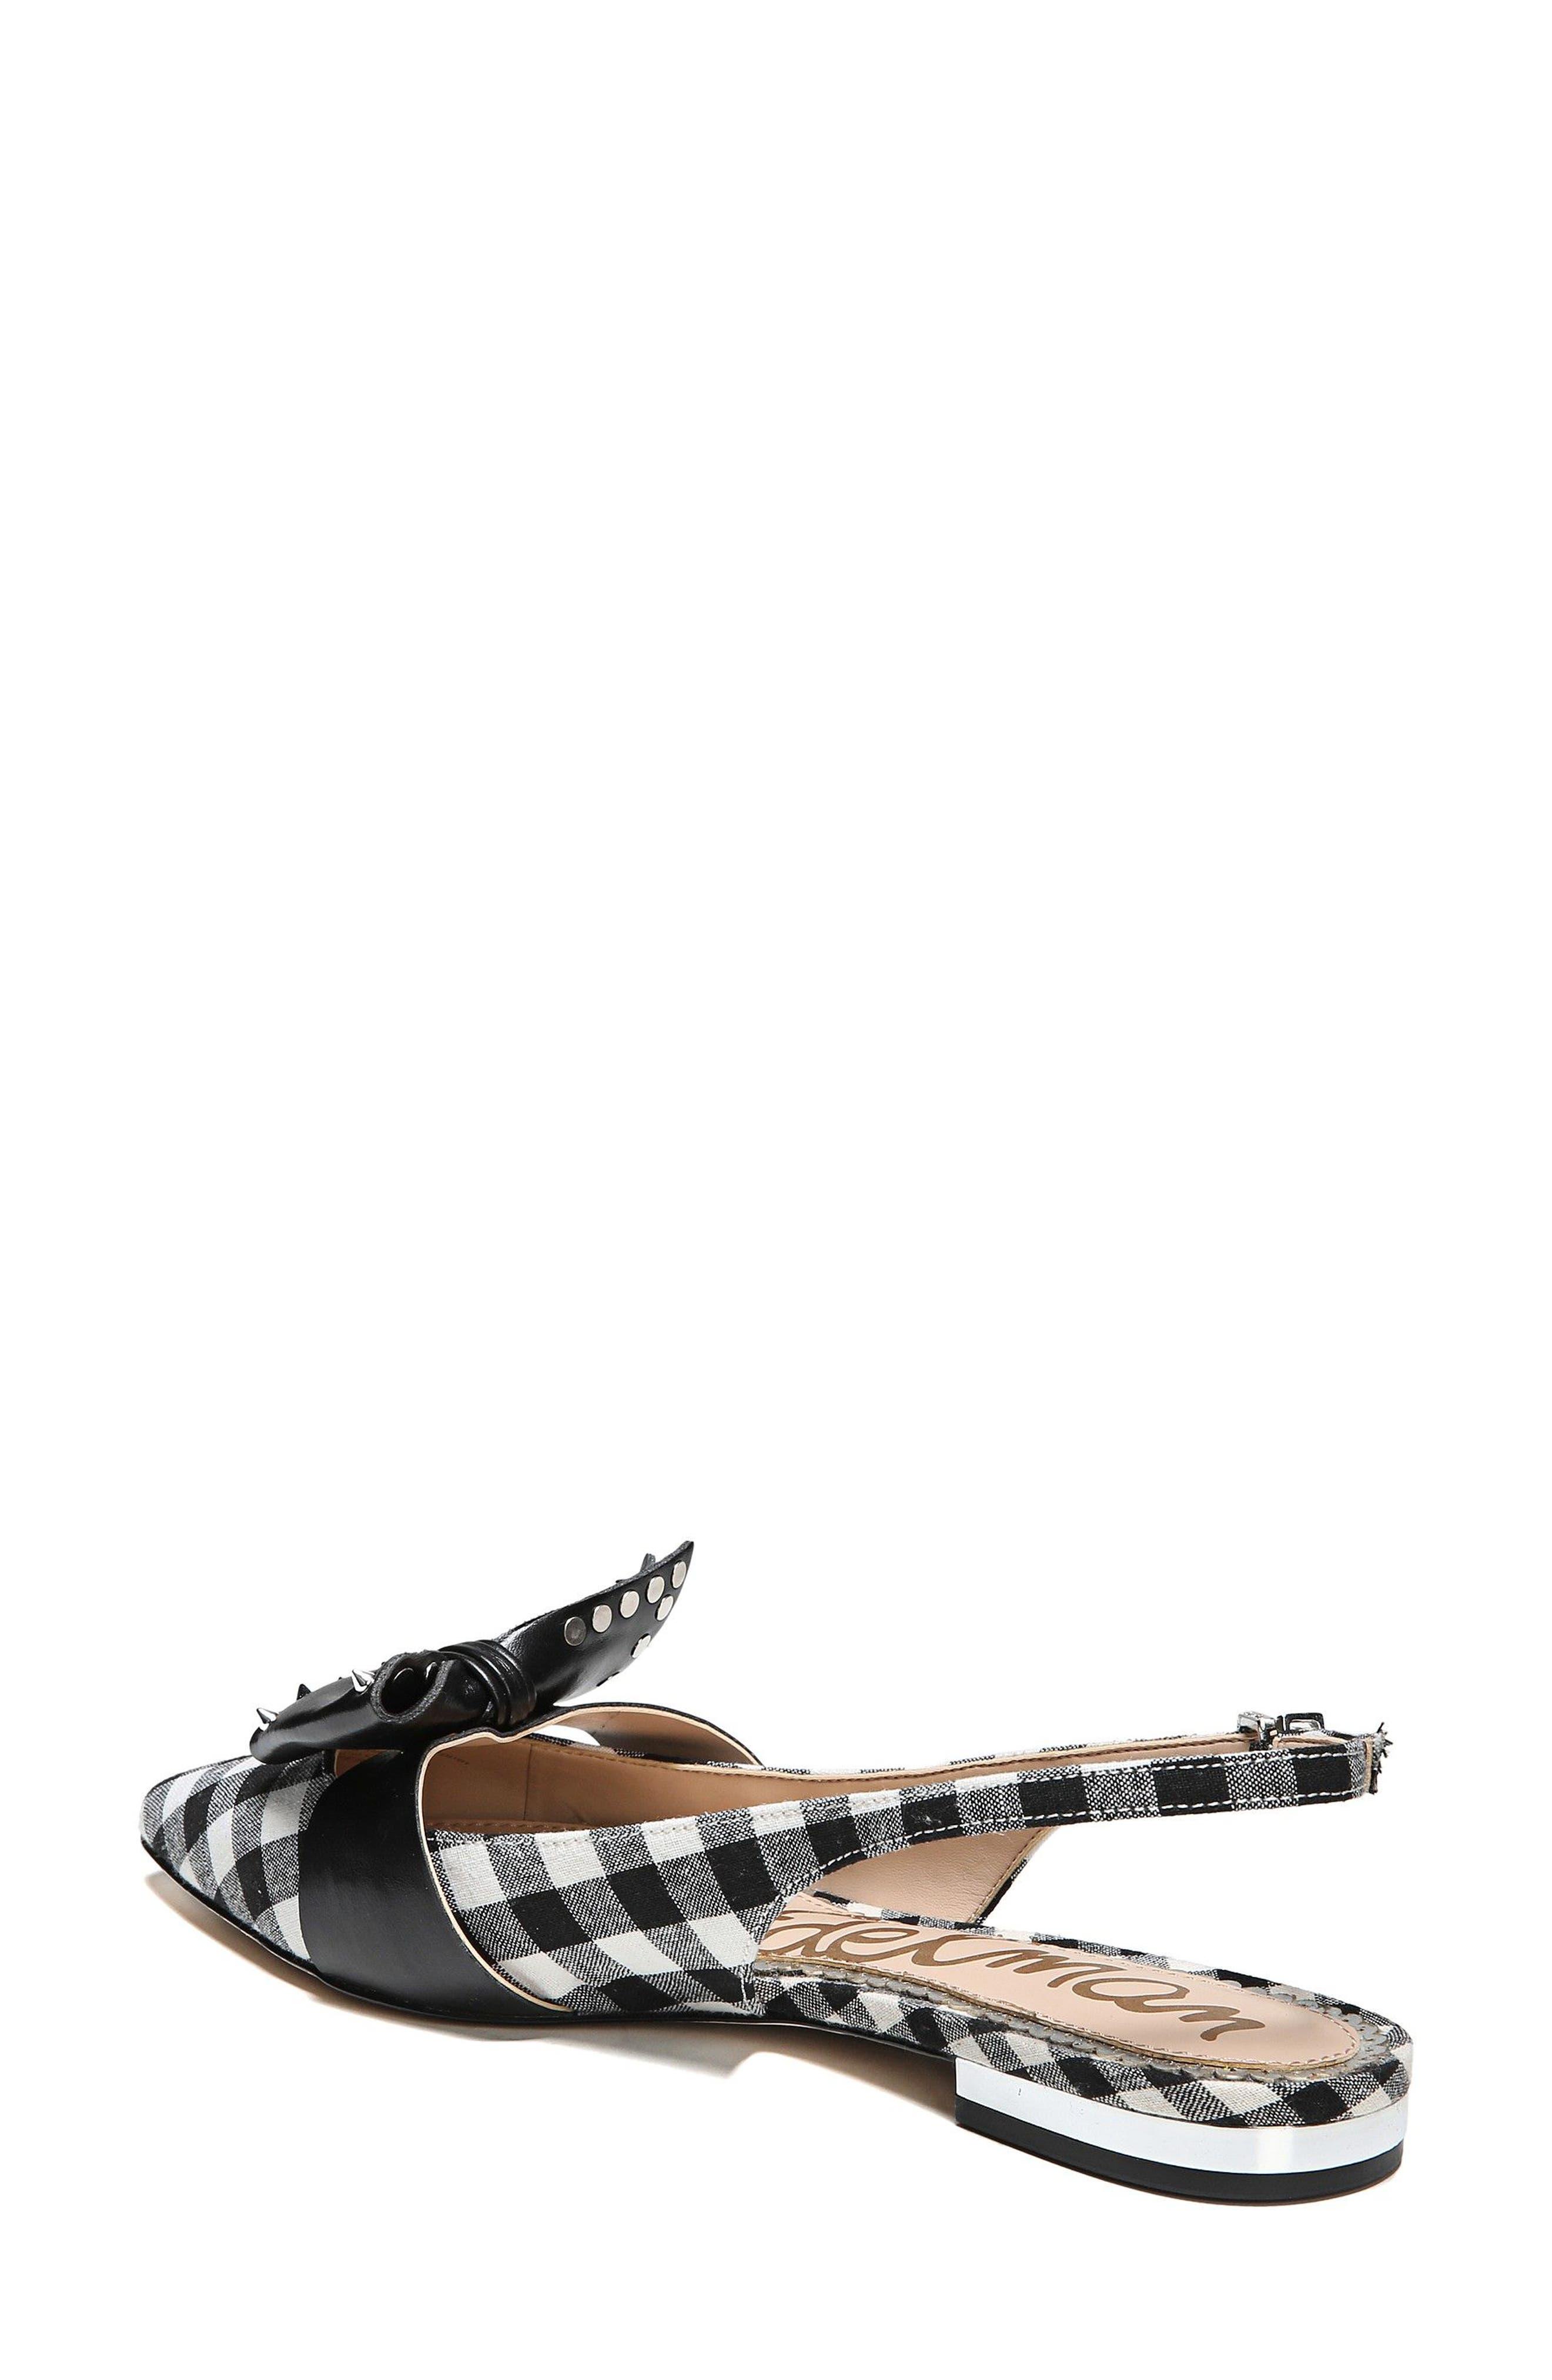 Rupert Bow Pointy Toe Flat,                             Alternate thumbnail 2, color,                             Black/ White Canvas